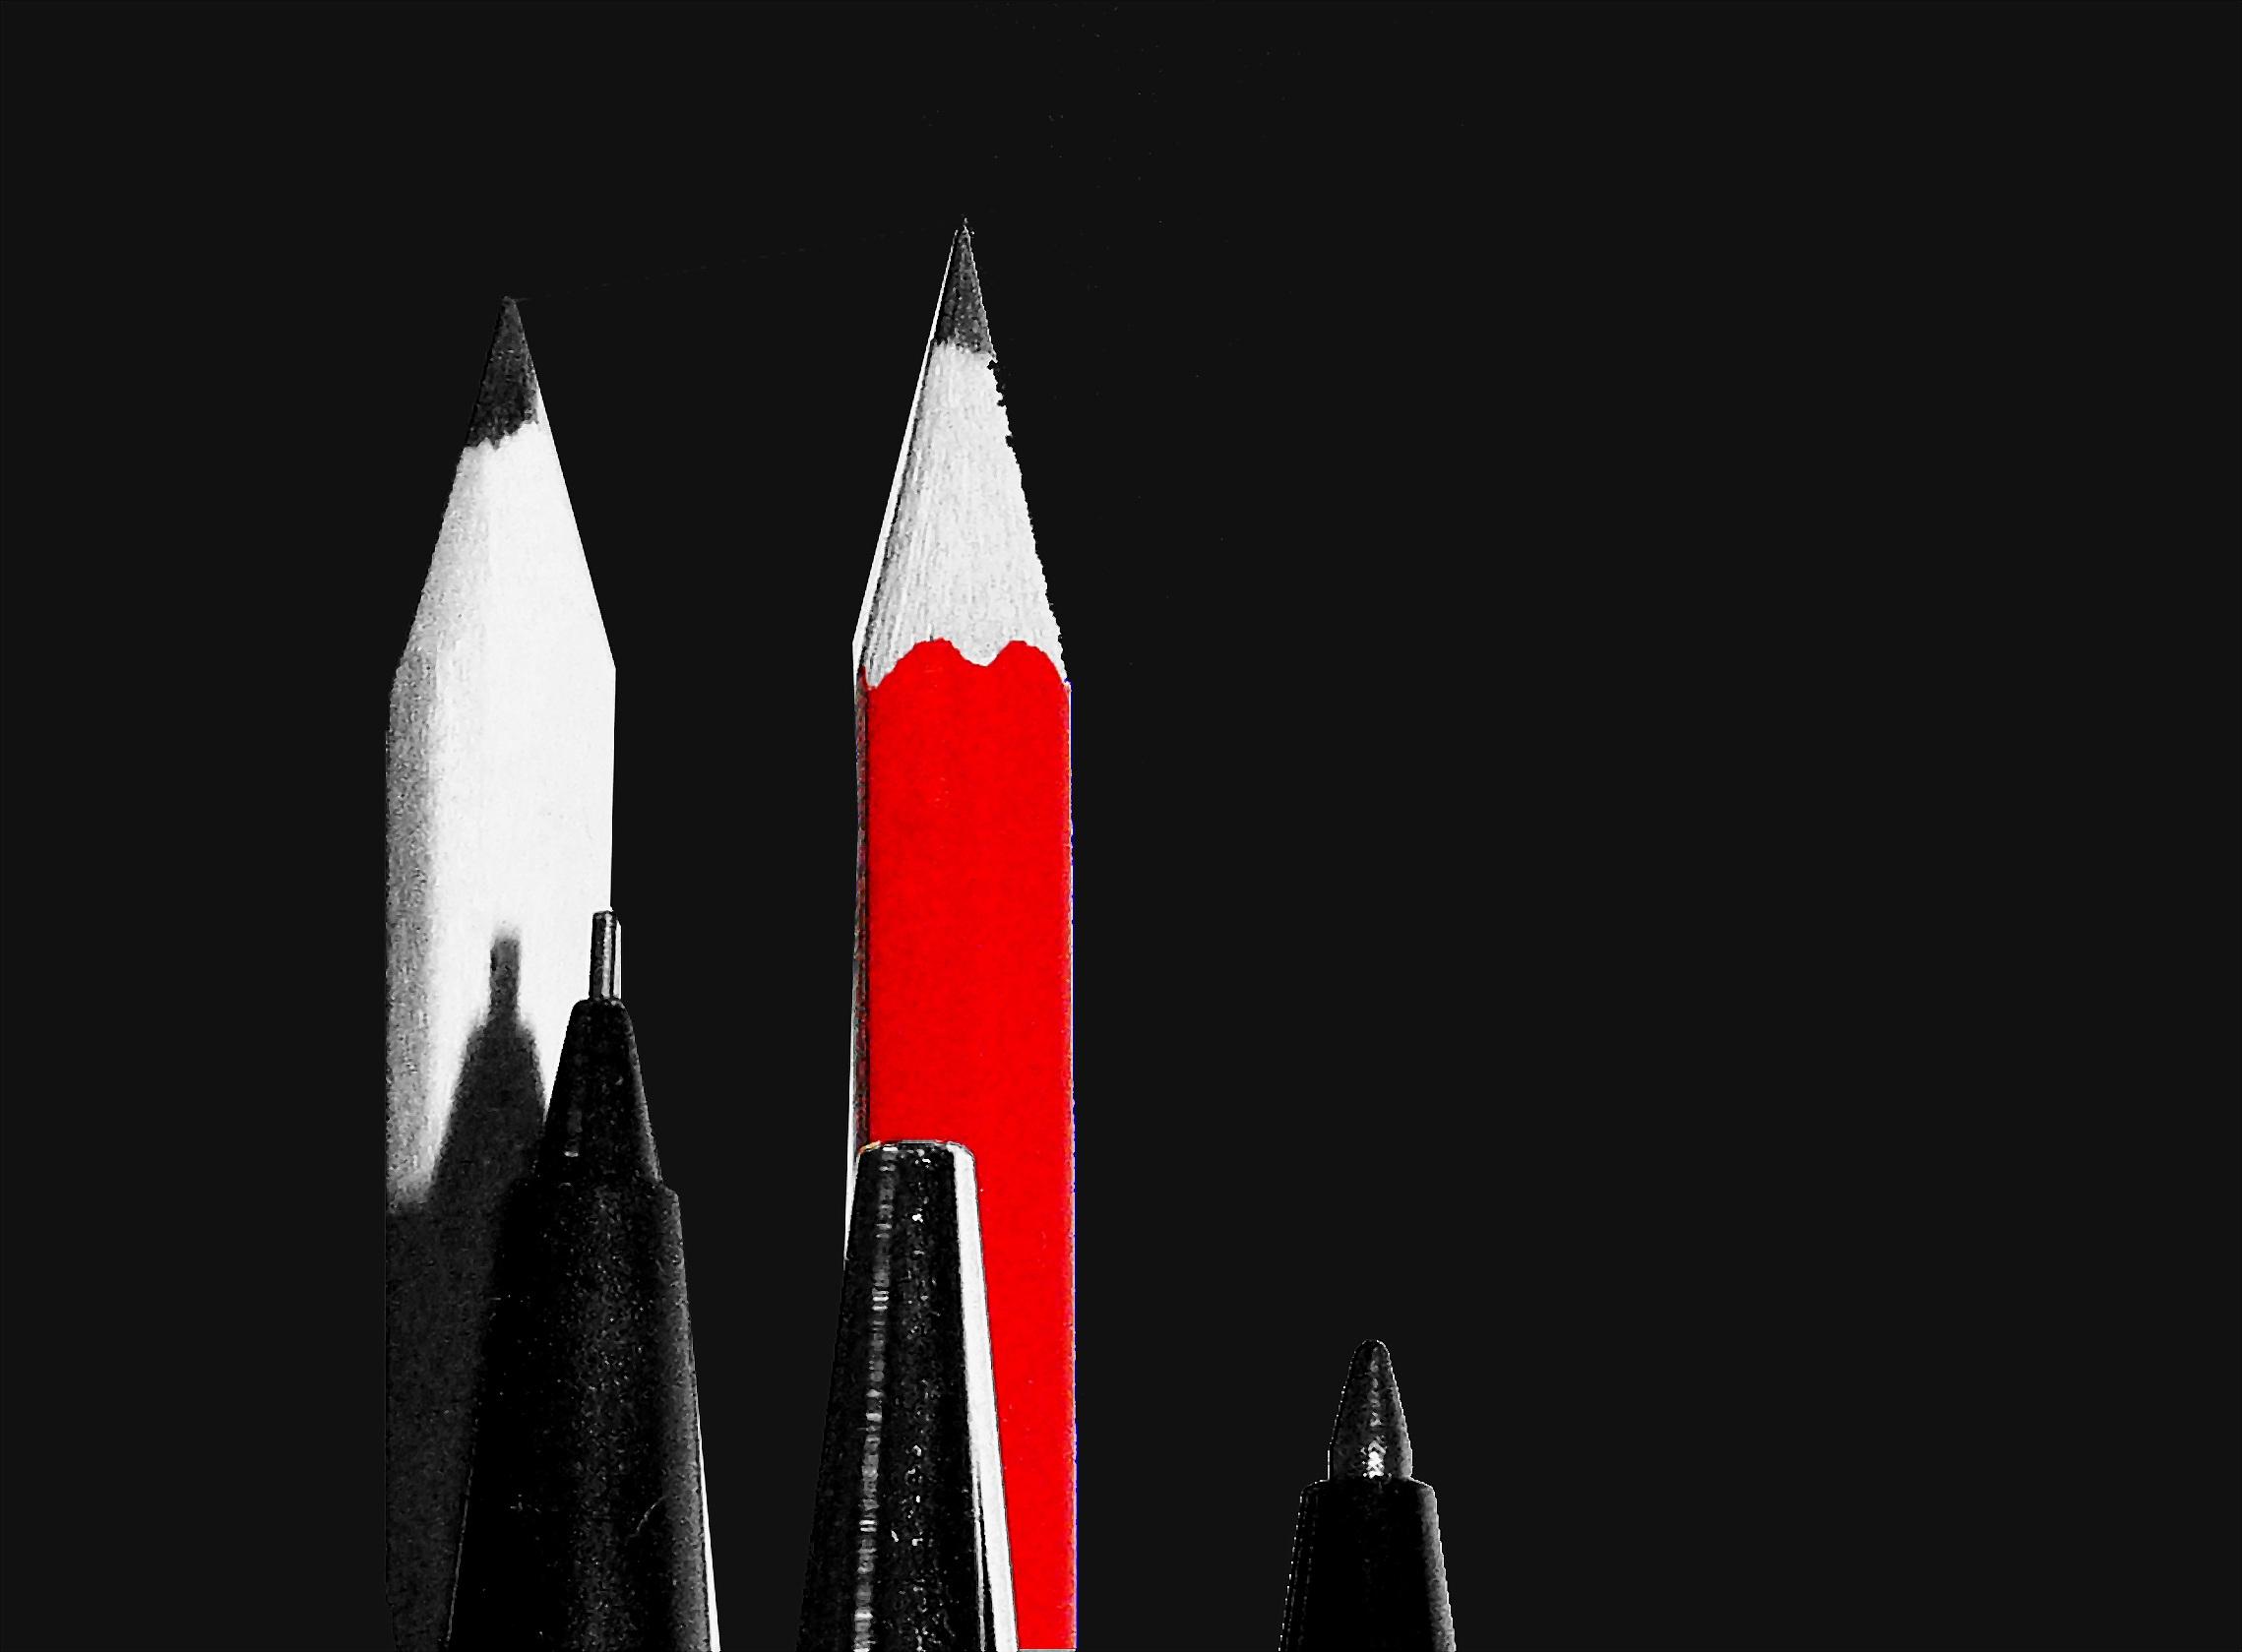 Gambar Hitam Dan Putih Kayu Merah Bendera Cat Kegelapan Satu